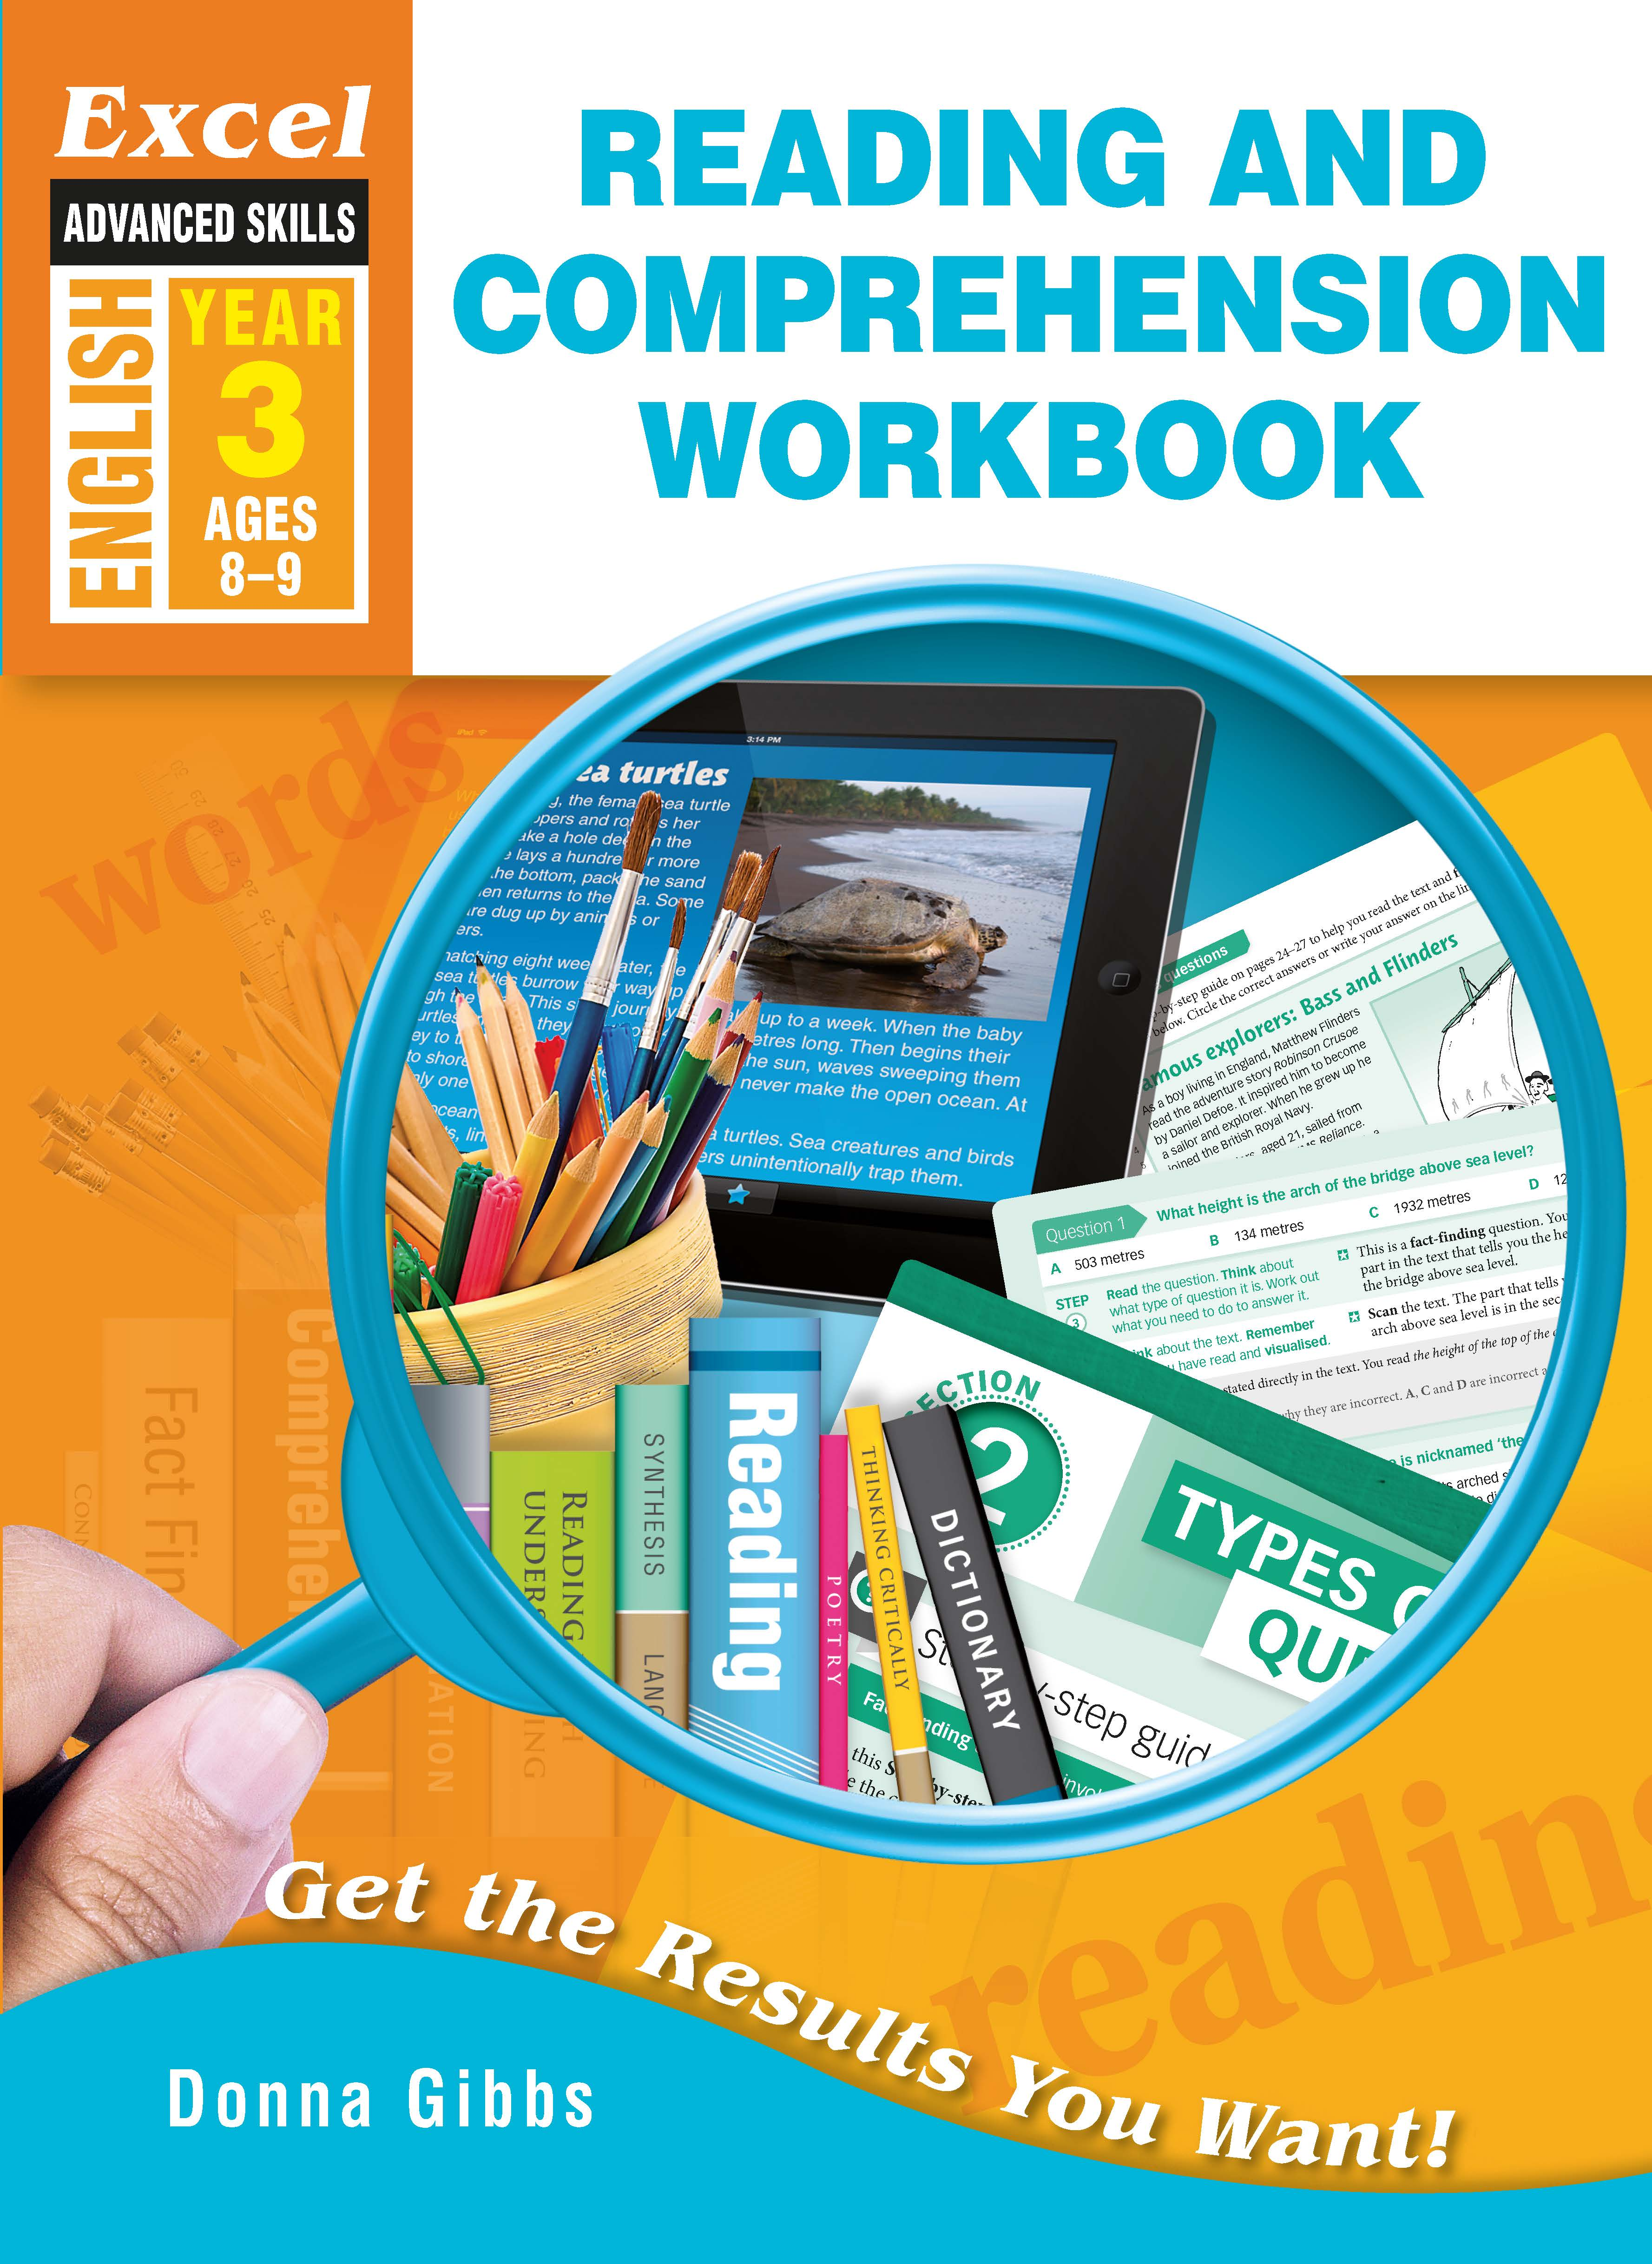 Excel Advanced Skills Workbook: Reading and Comprehension Workbook Year 3